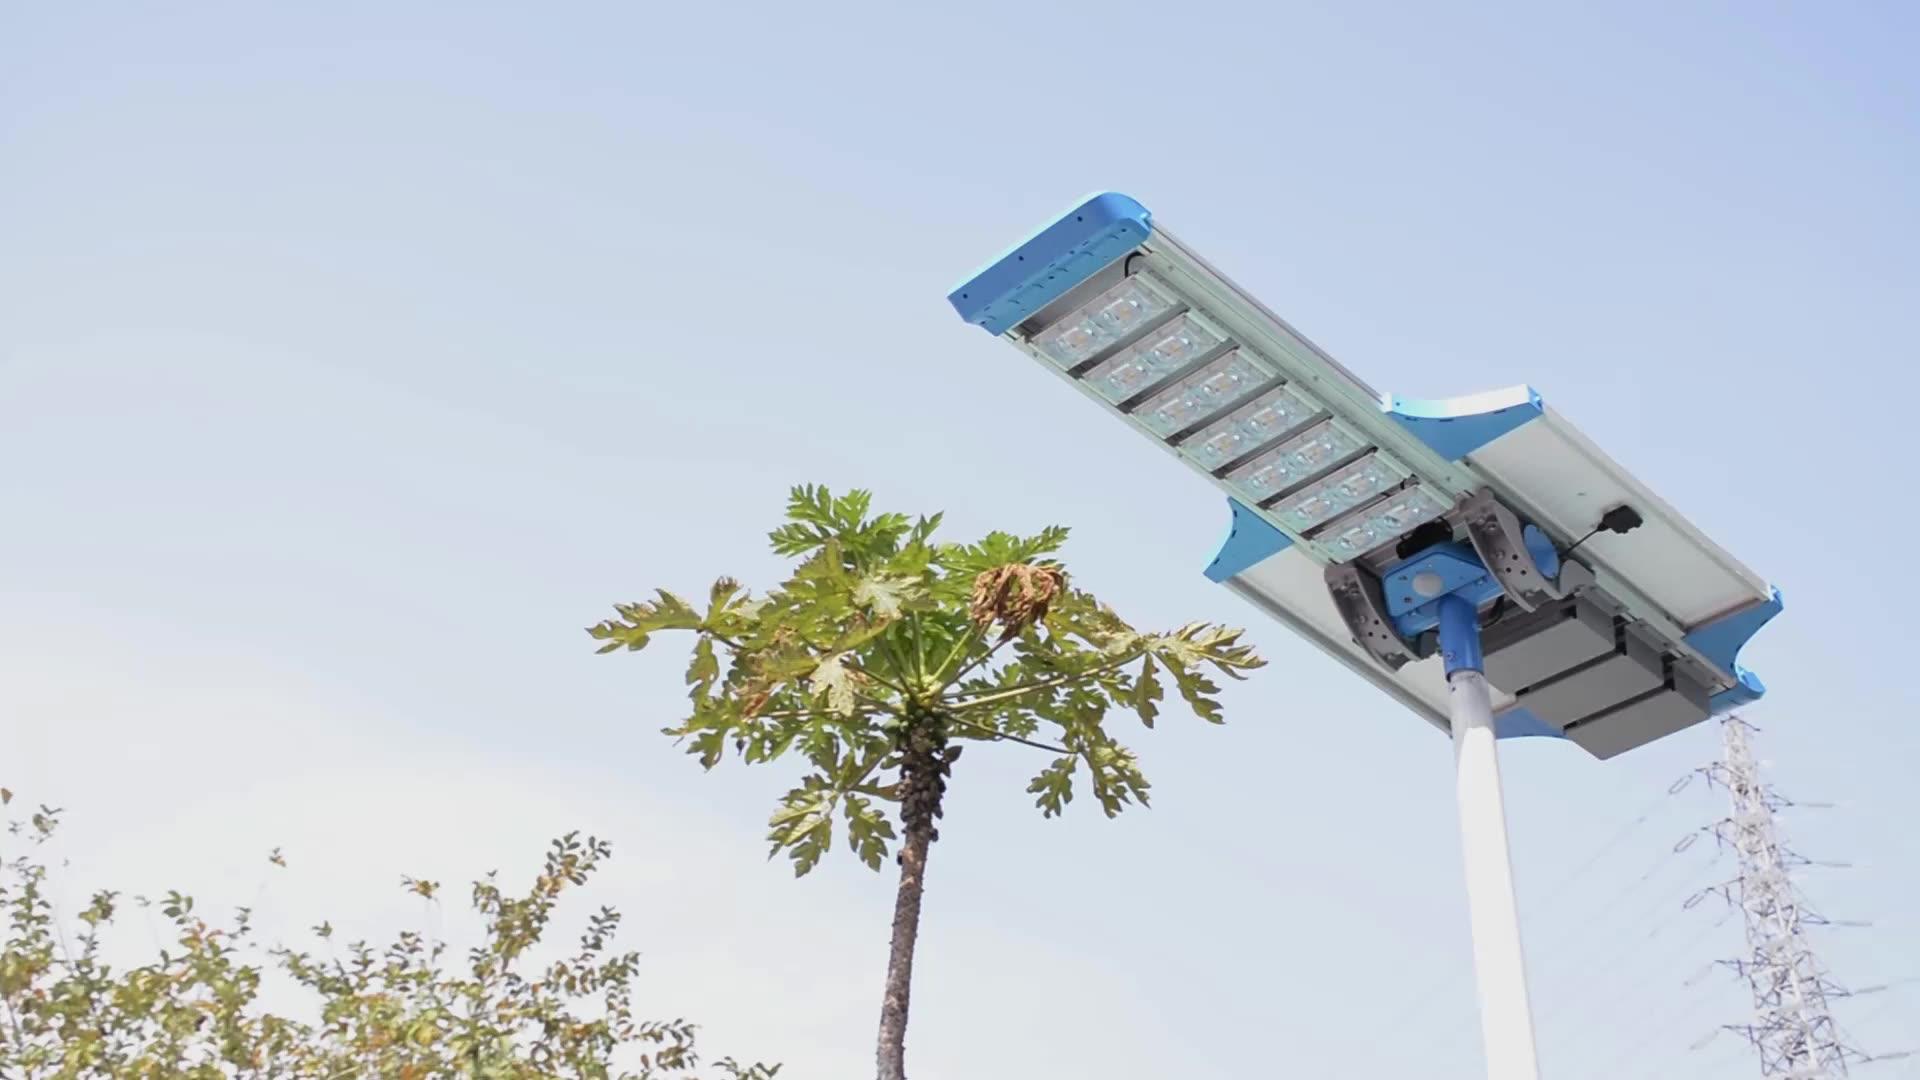 Sresky 2020 new design smart city lighting solution Intelligent network pir motion led solar street lights with APP control